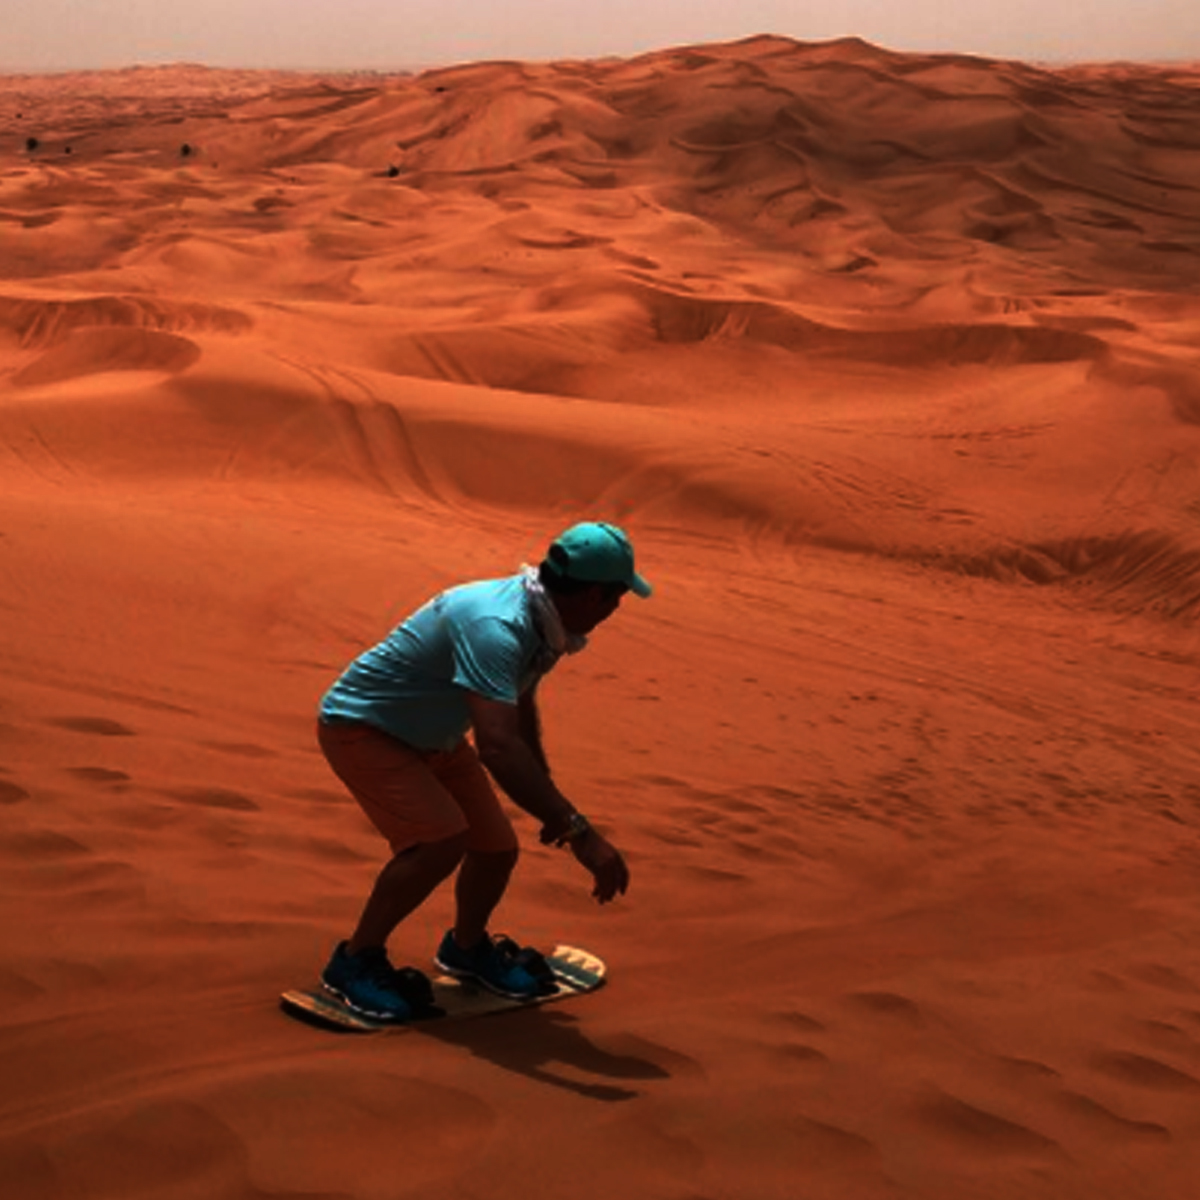 Sand boarding experience - Dubai Desert Safari